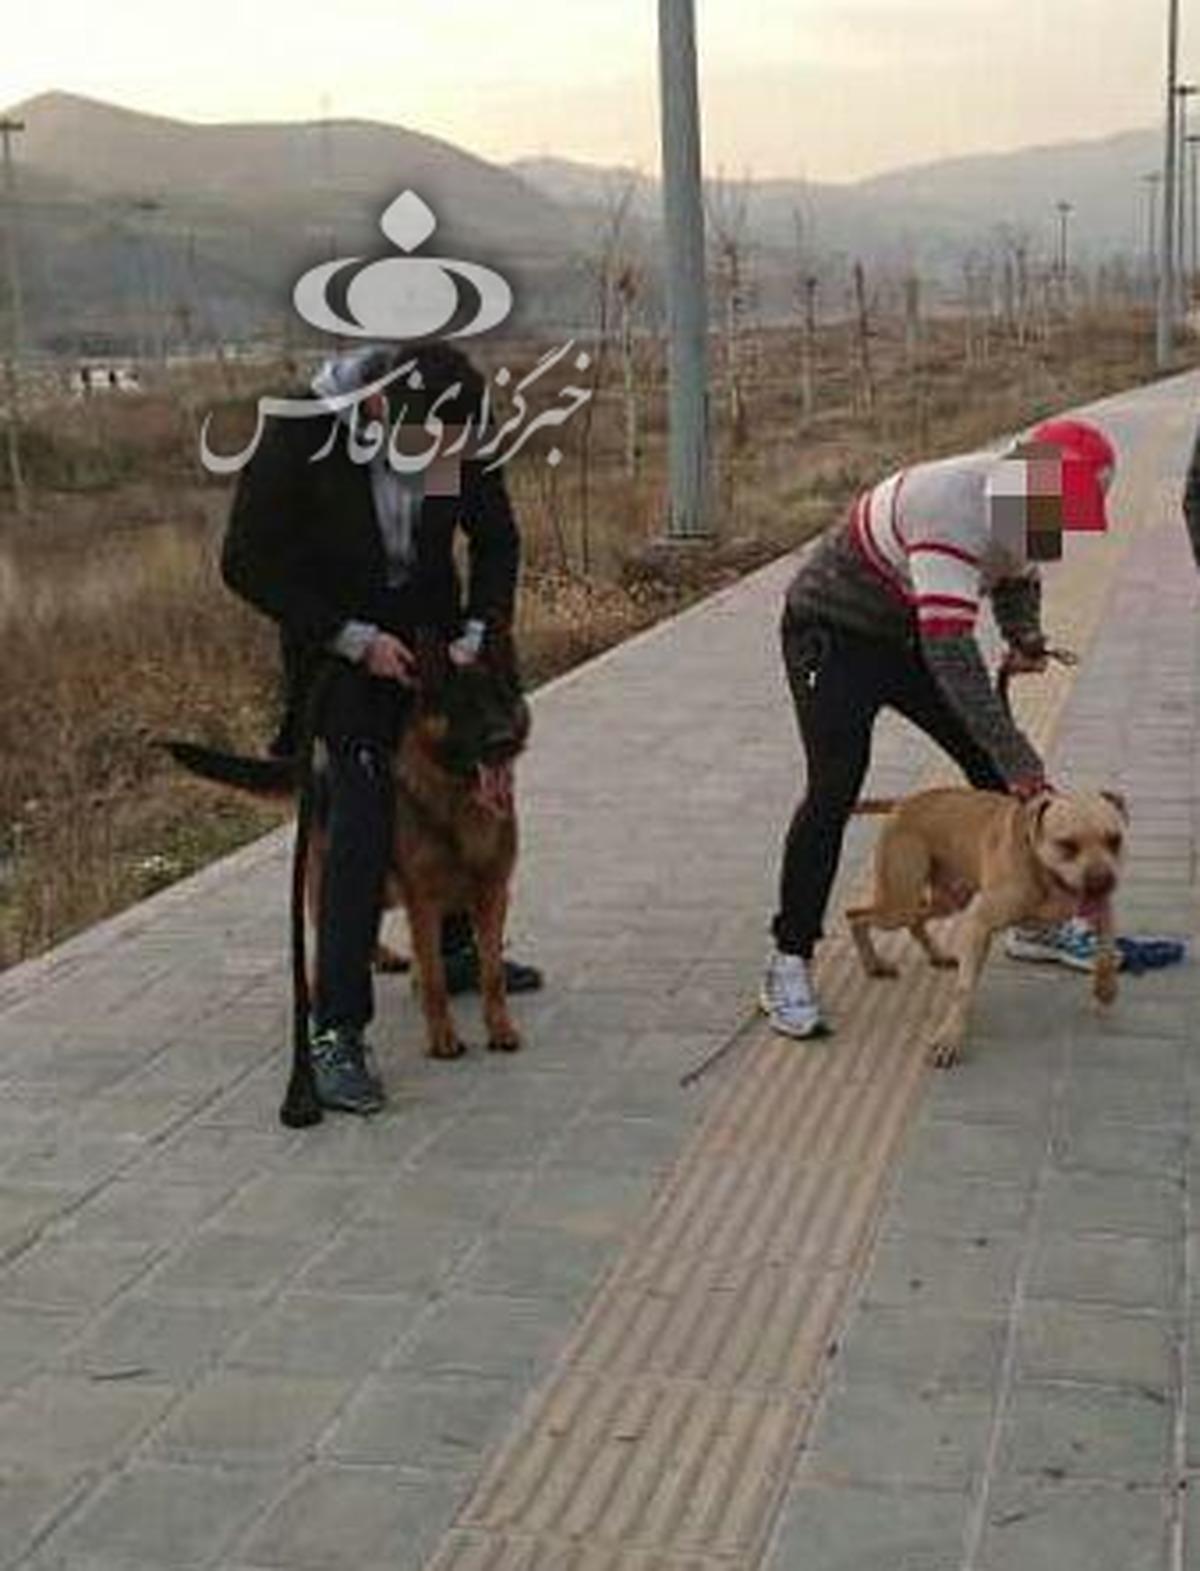 عکس وحشتناک حمله دو سگ به دختر ۱۰ ساله